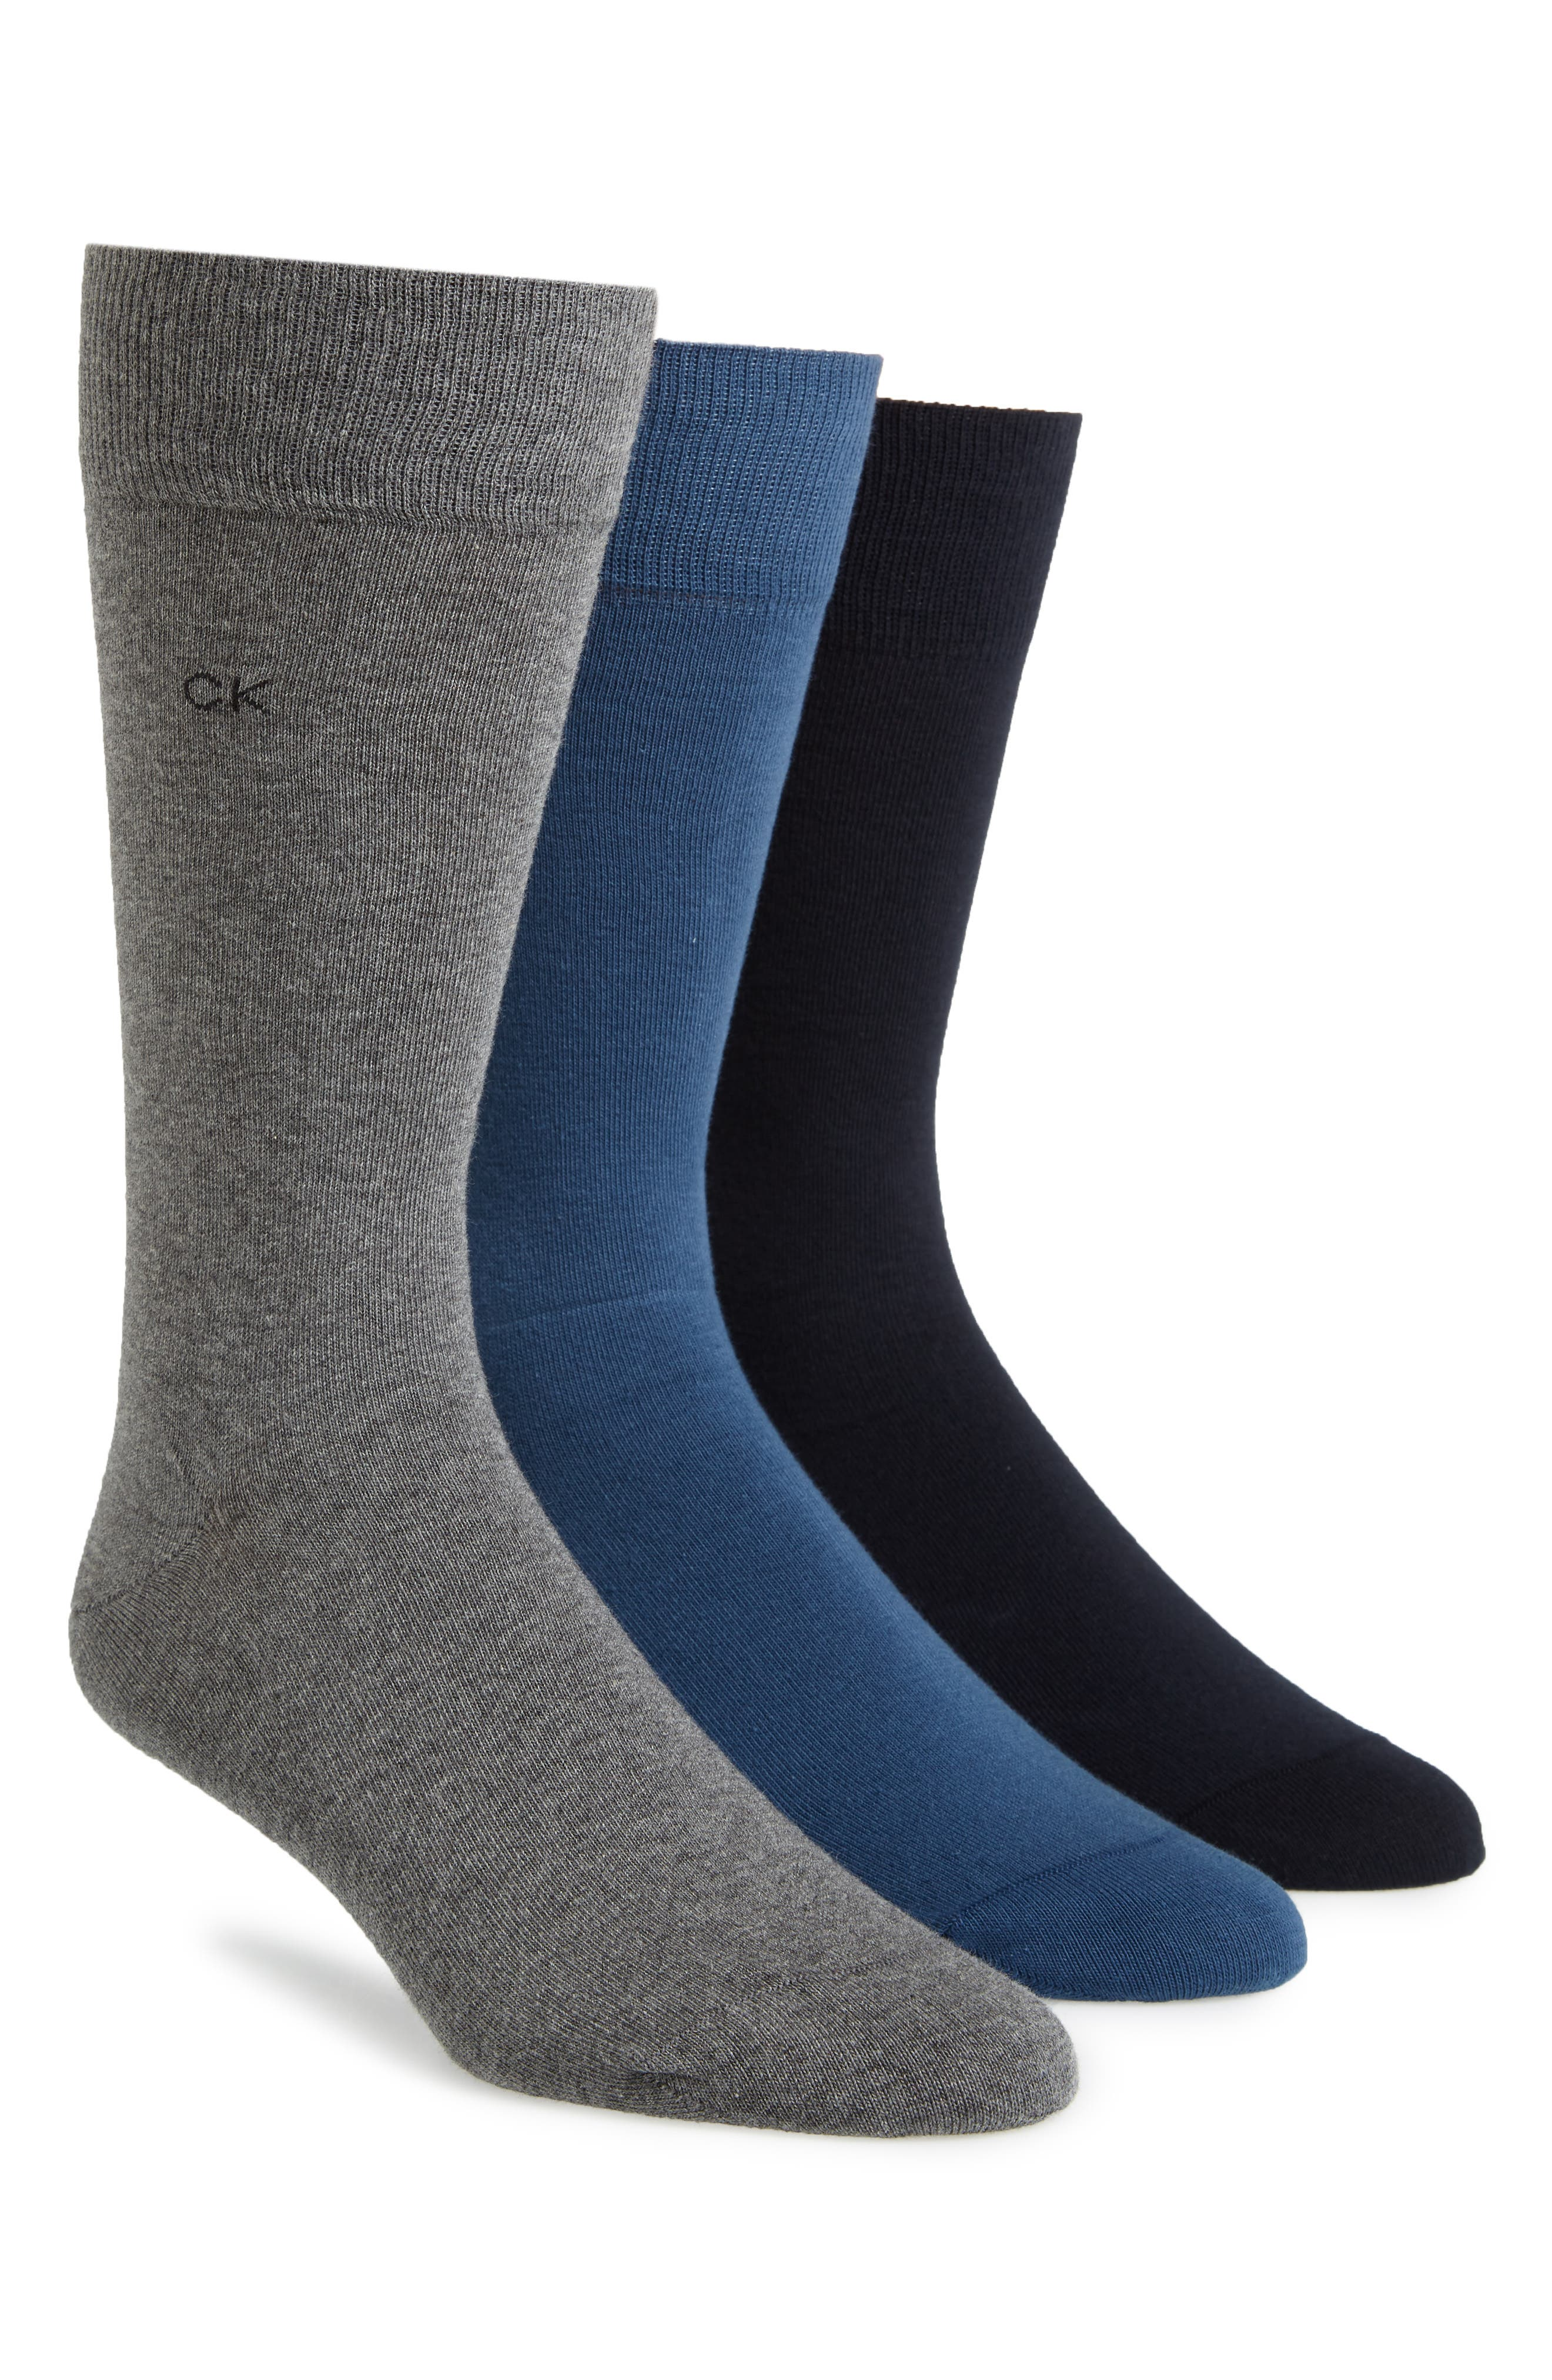 Alternate Image 1 Selected - Calvin Klein Assorted 3-Pack Socks